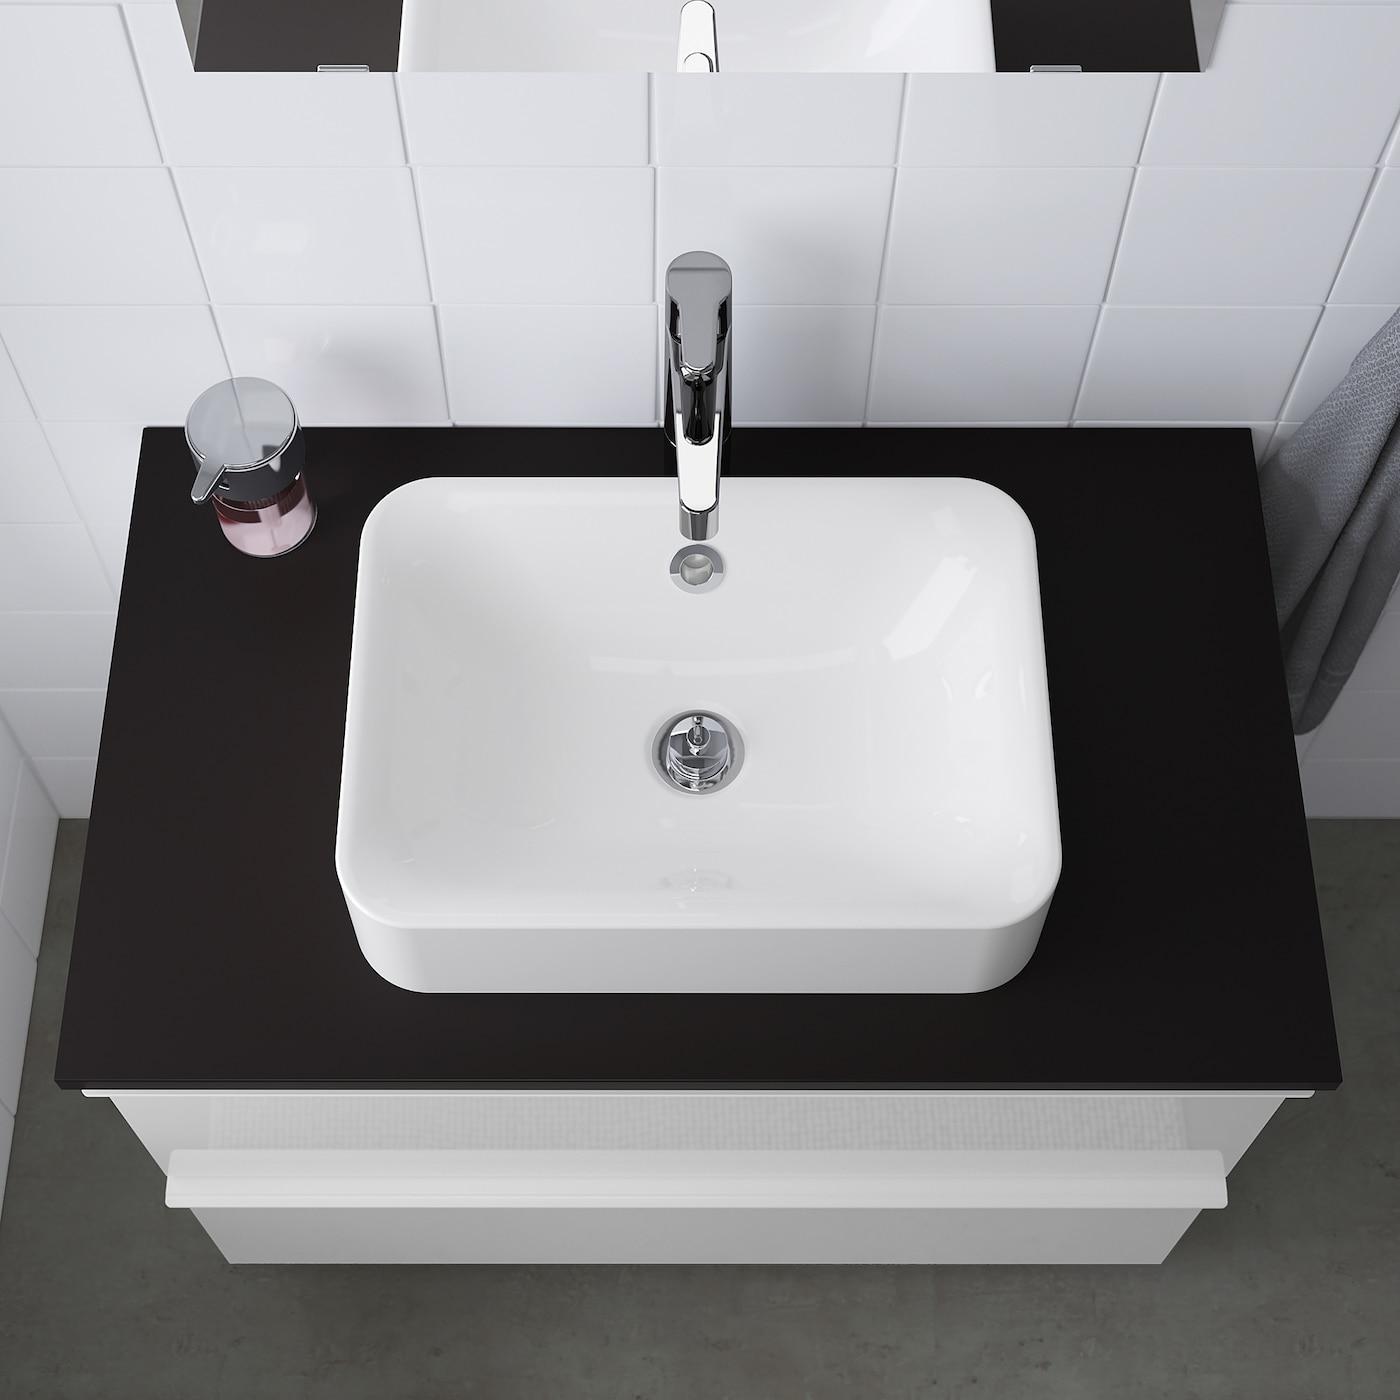 Hörvik Countertop Sink White 17 3 4x12 5 8 Ikea